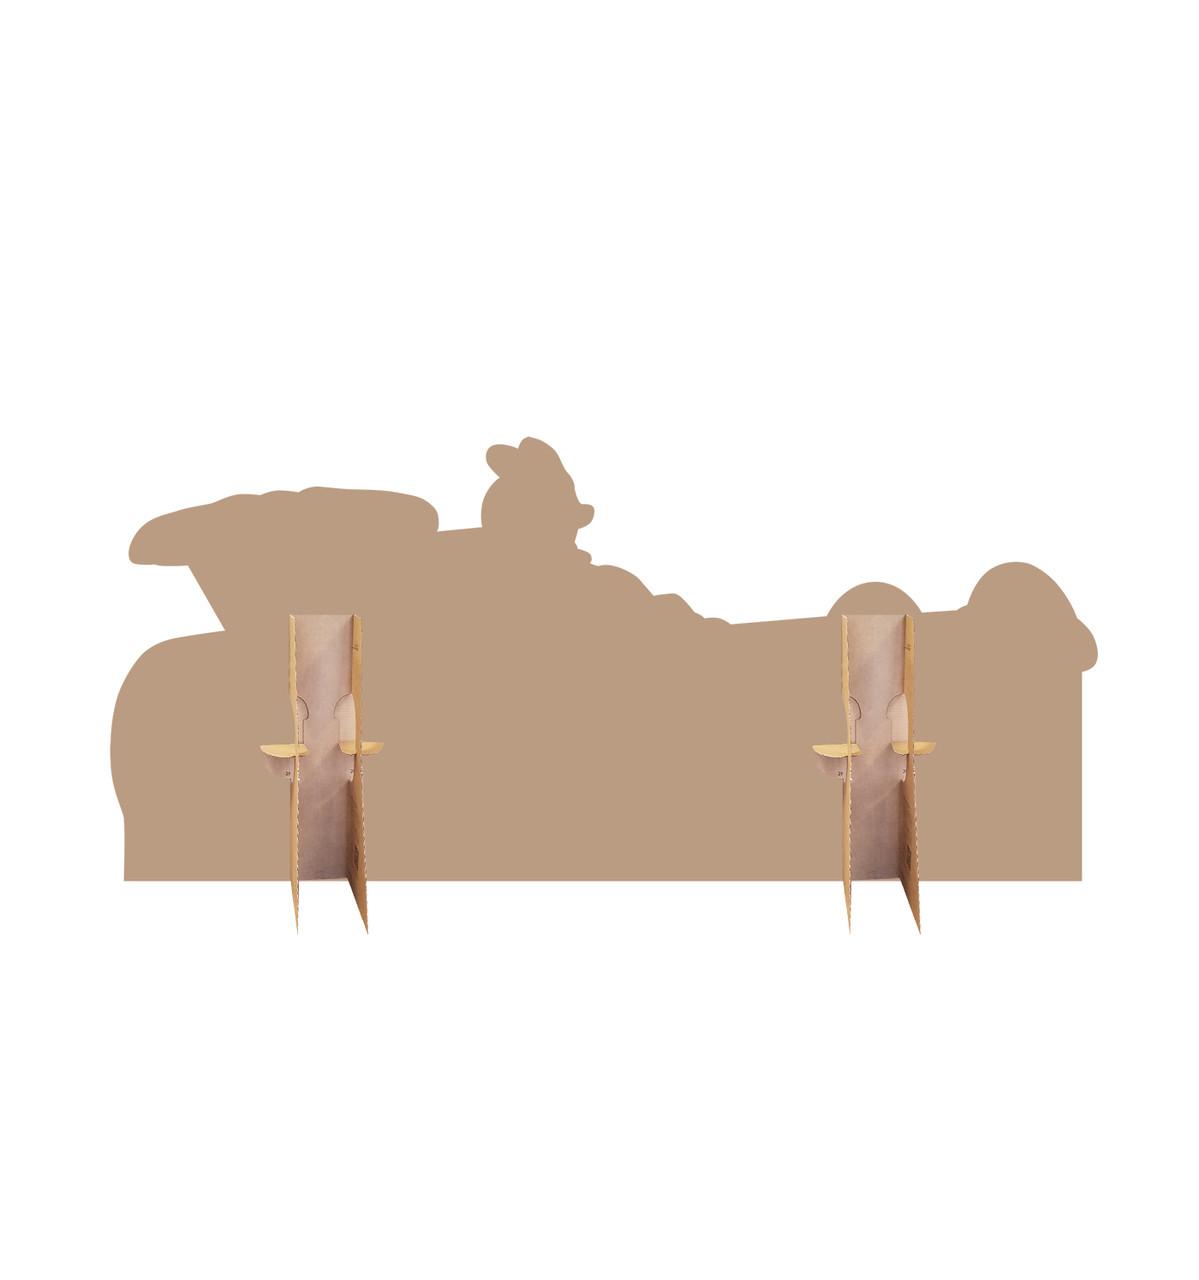 Life-size Daisy Roadster (Disney's Roadster Racers) Cardboard Standup | Cardboard Cutout